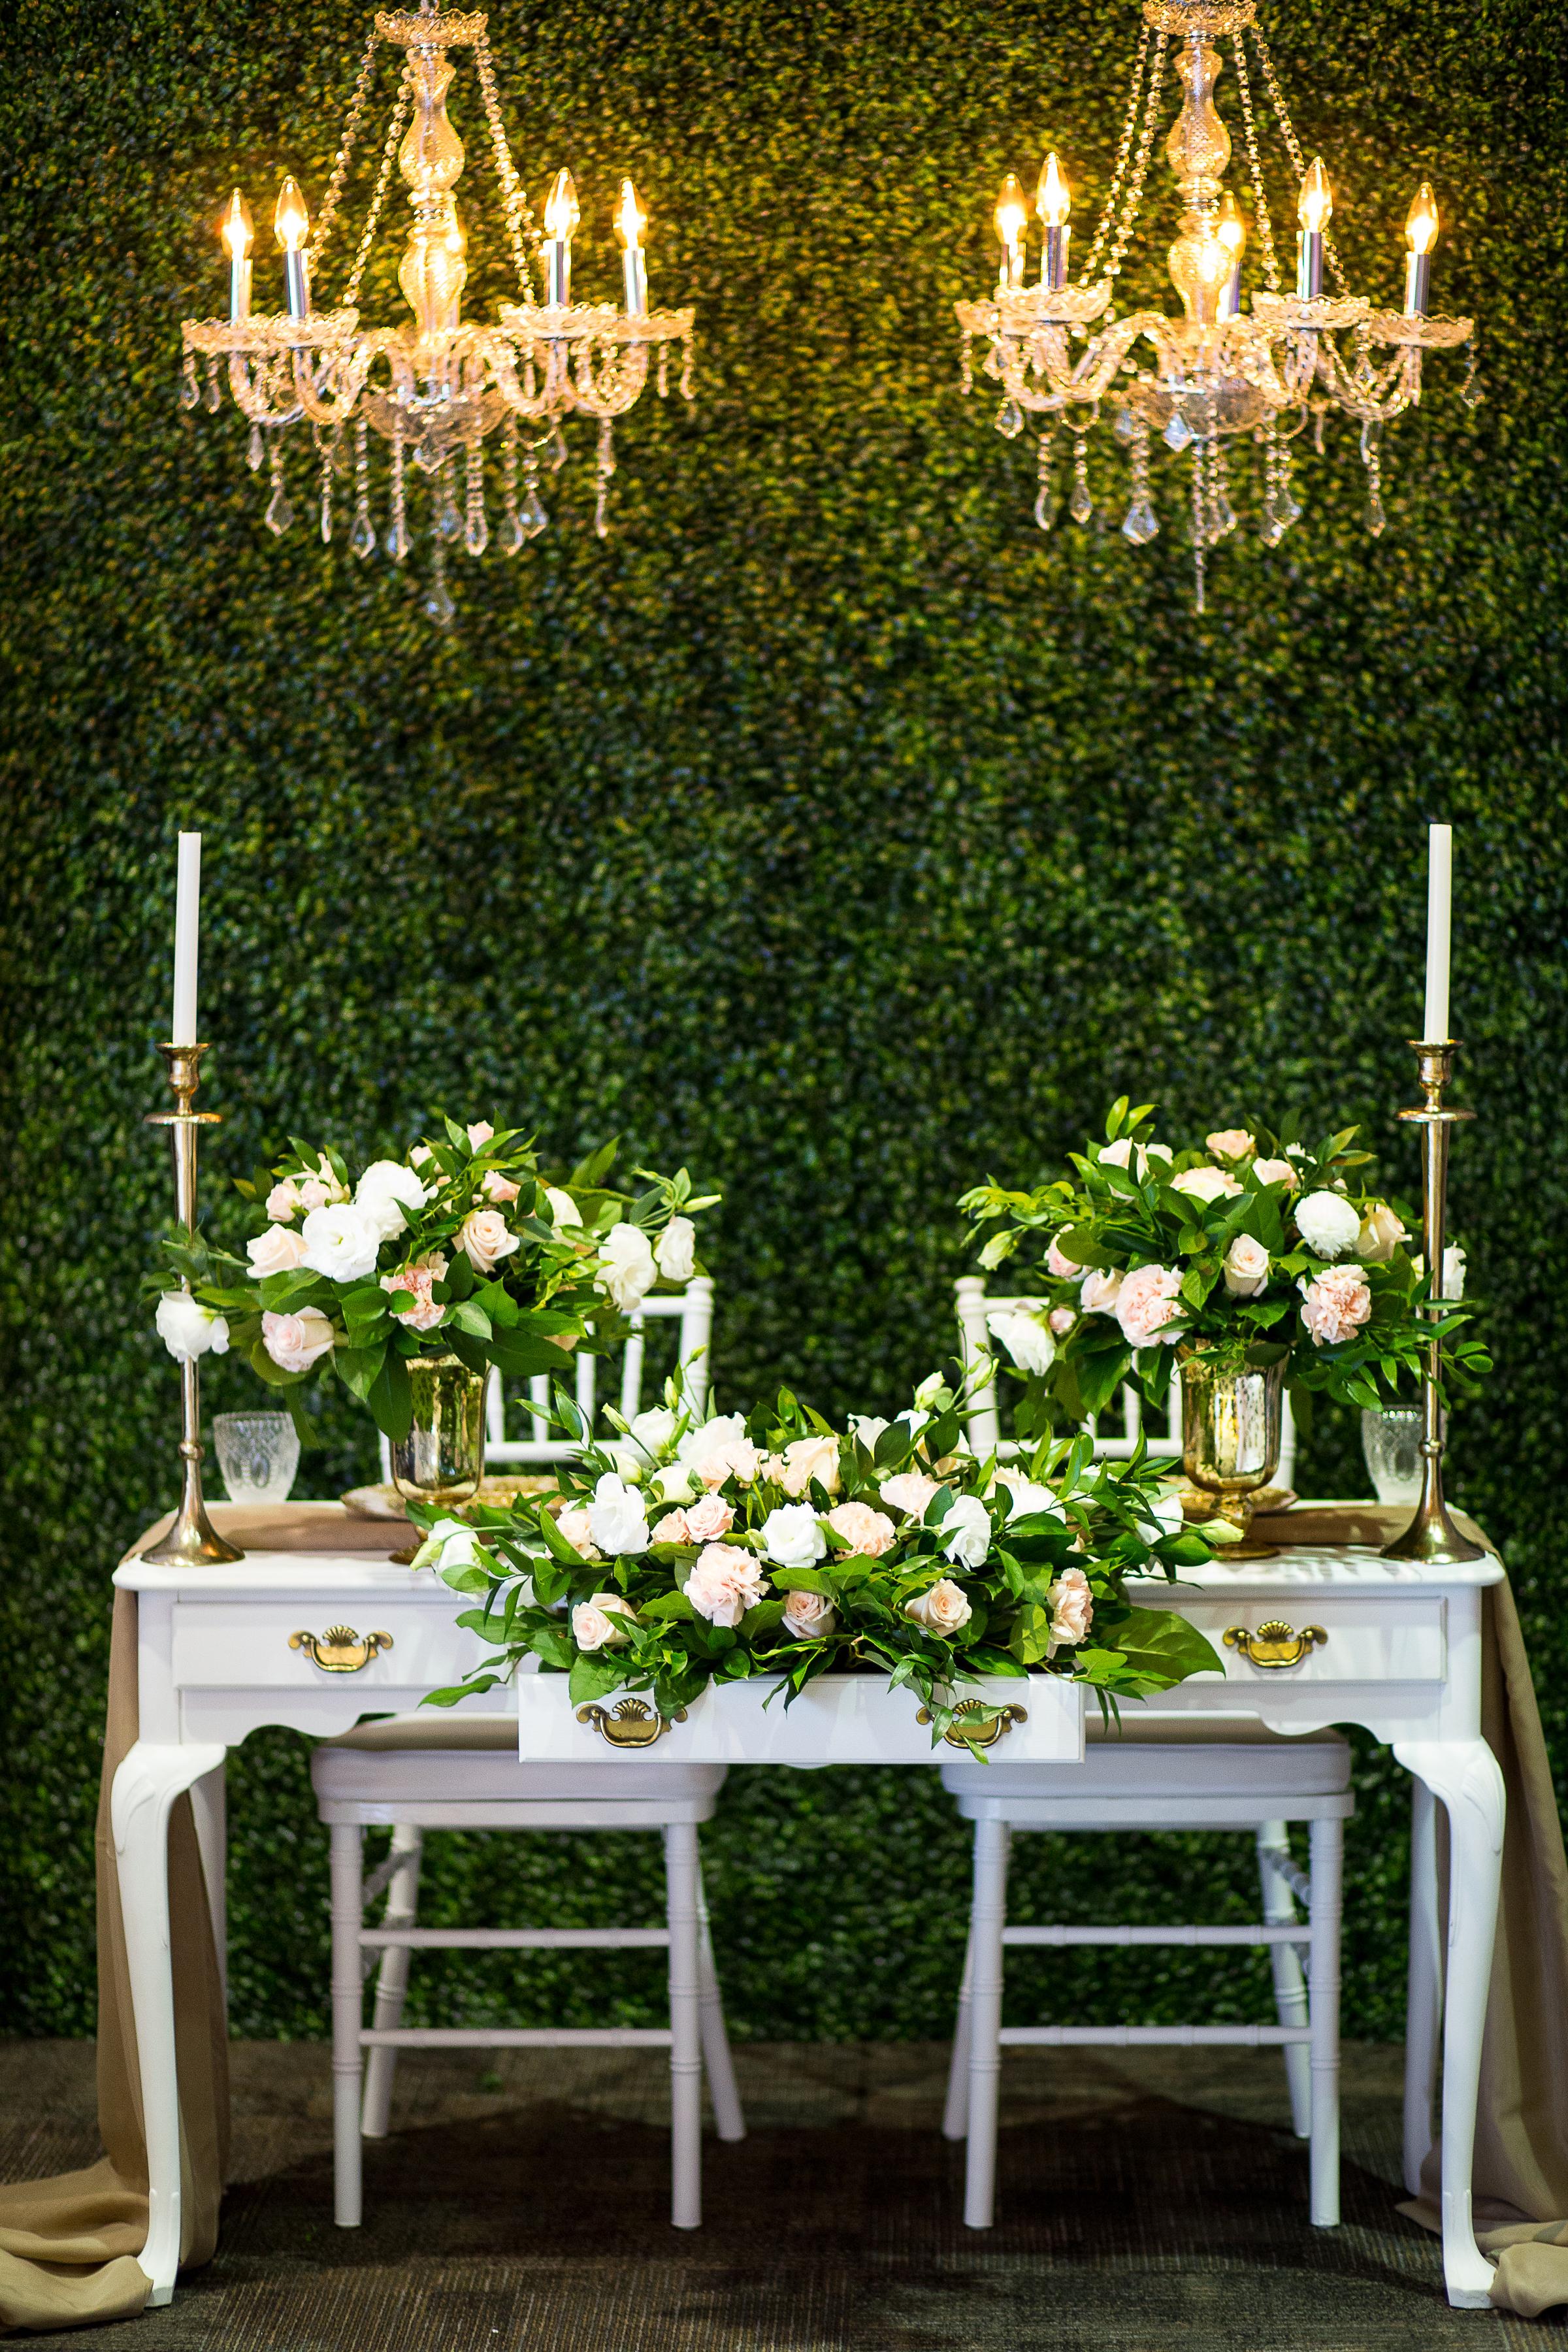 Superb Wedding Show Wedding Decor Booth Display Hamilton Fall 2017 Complete Home Design Collection Epsylindsey Bellcom